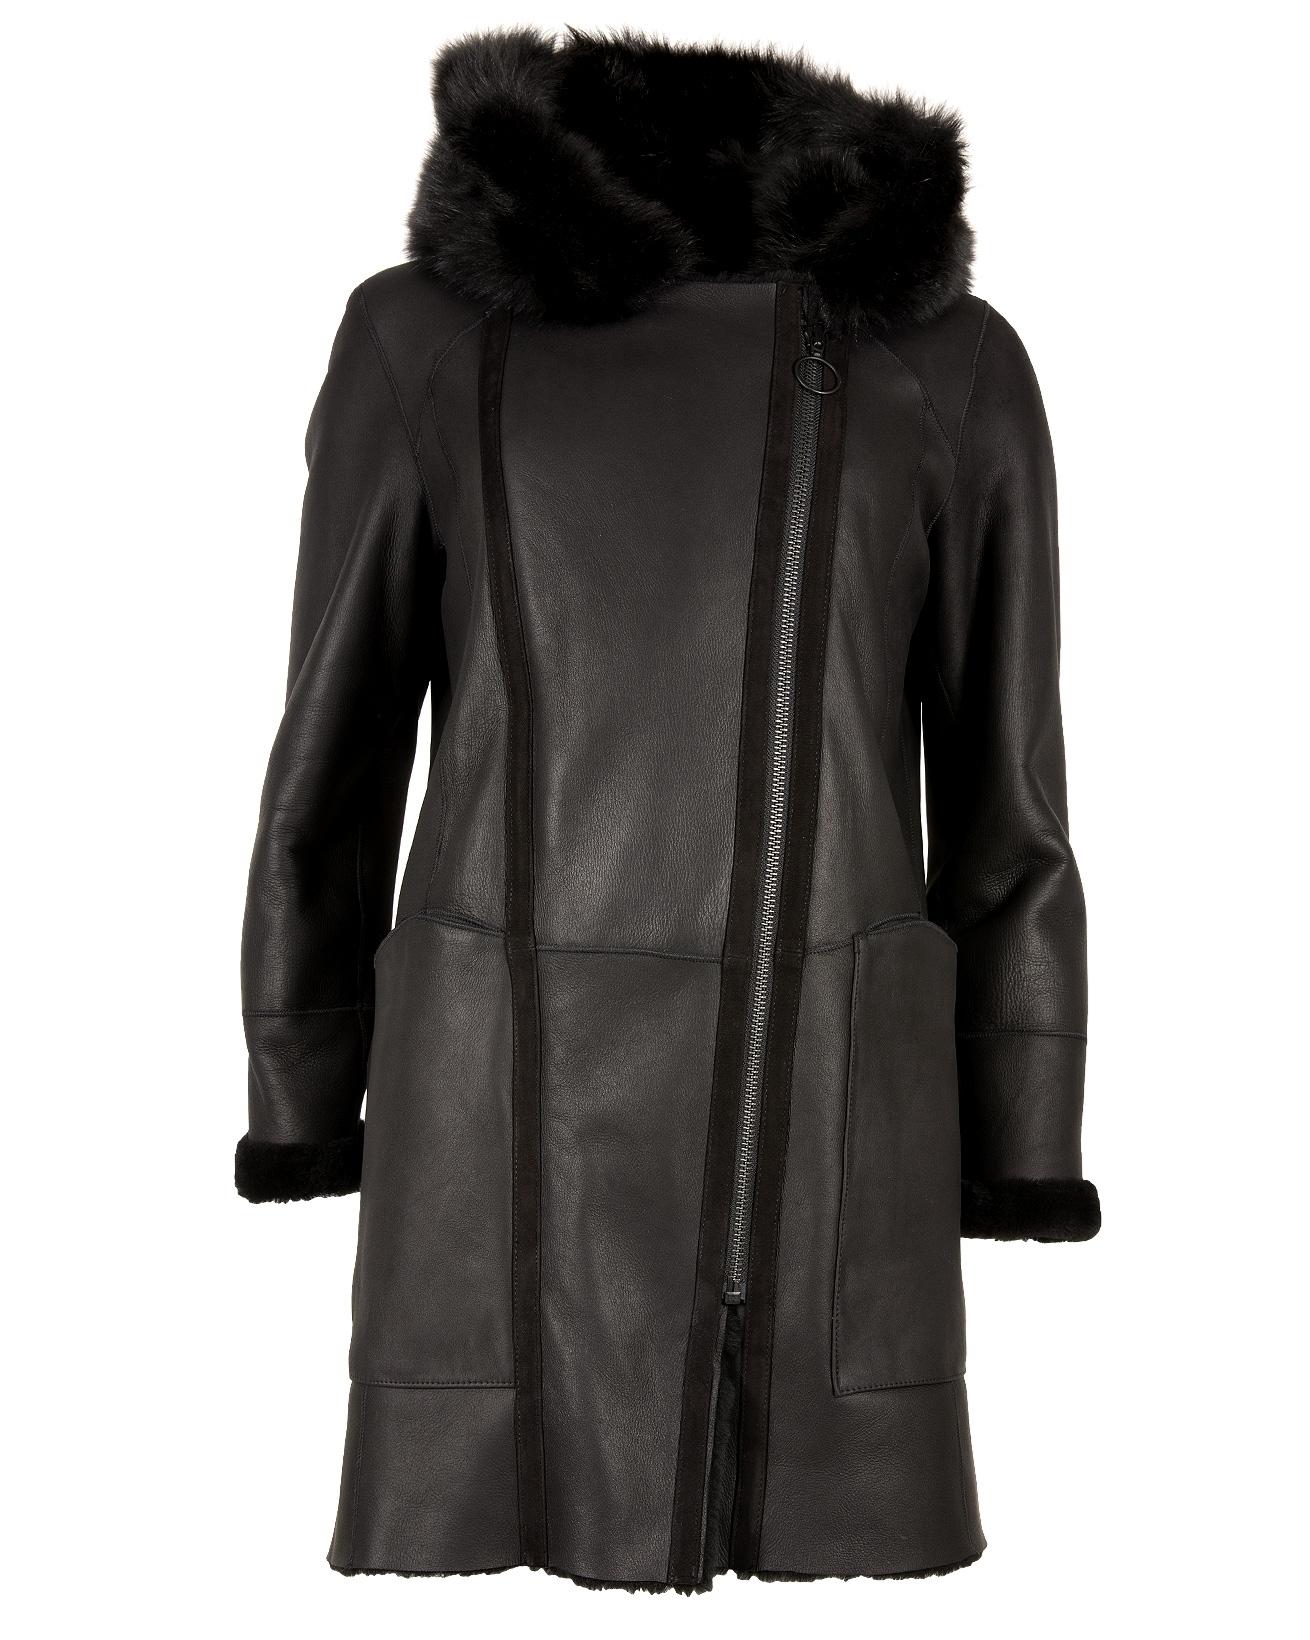 Reversible Merino Double Zip Parka - Size 10 - Black - 1209